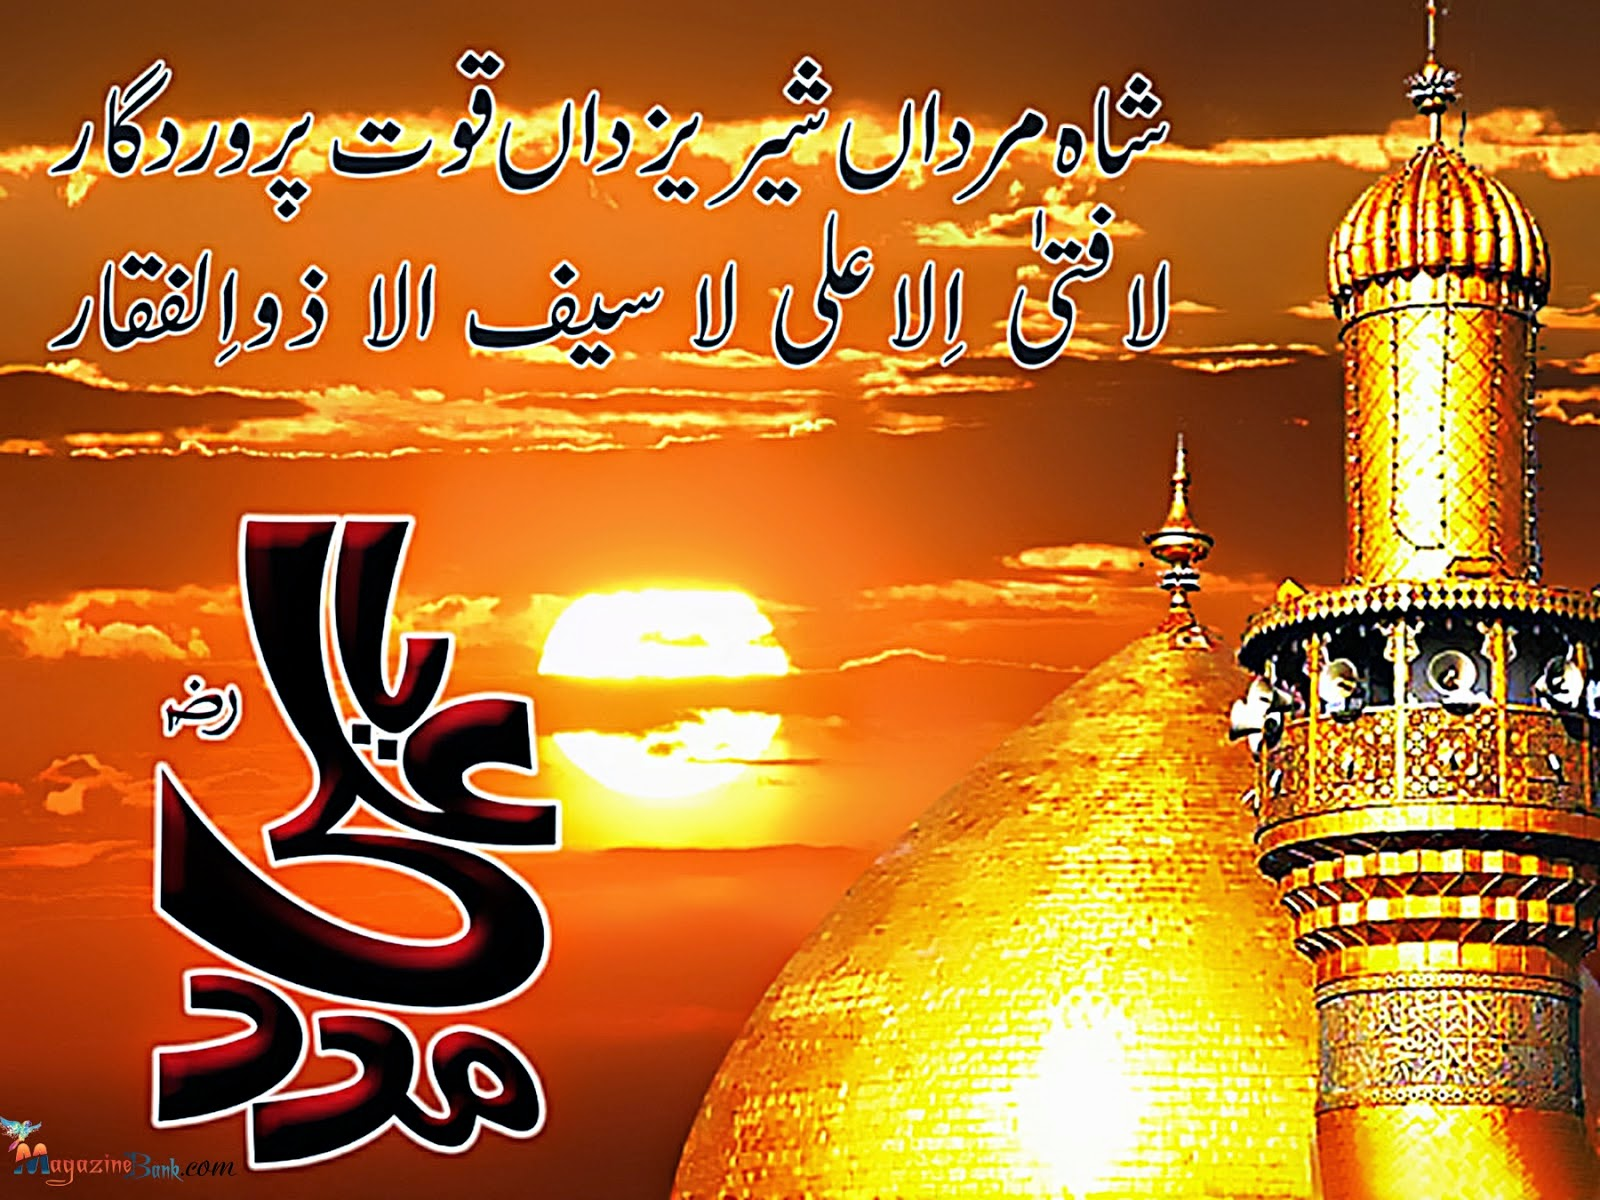 Maula Ali Shrine Wallpaper: Latest SMS Collection: Latest Muharram